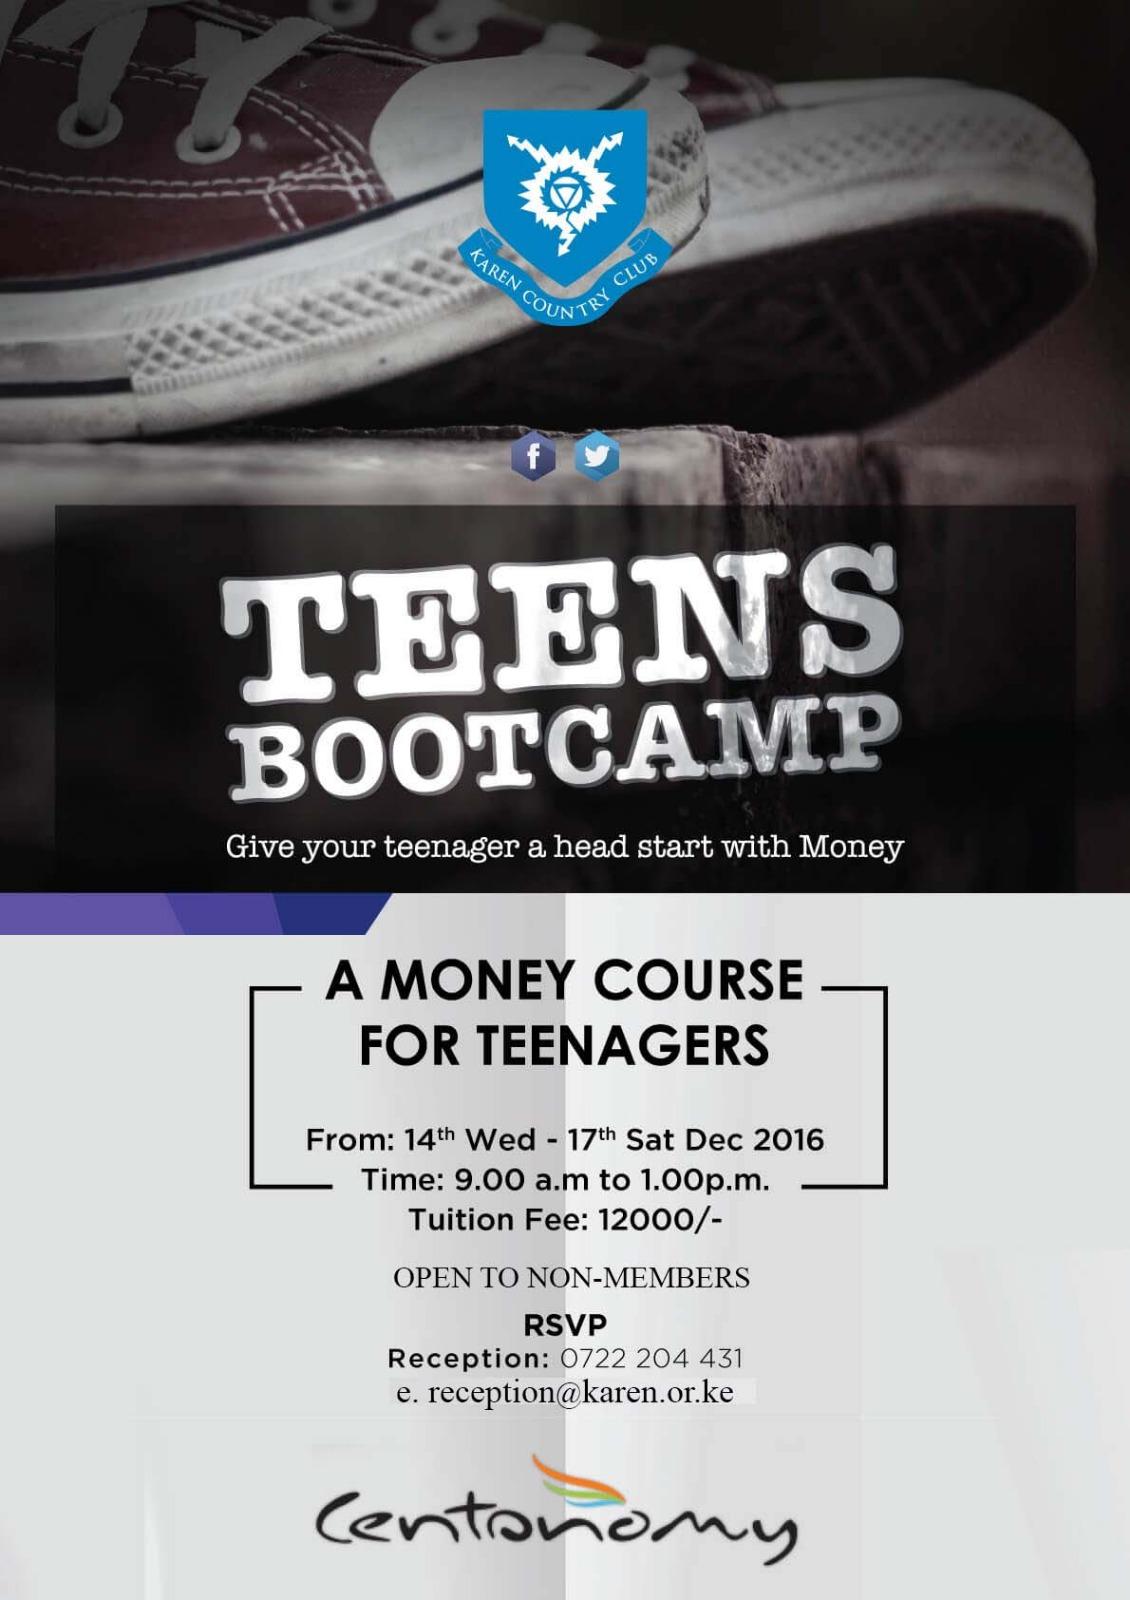 Centonomy Teens' Boot Camp